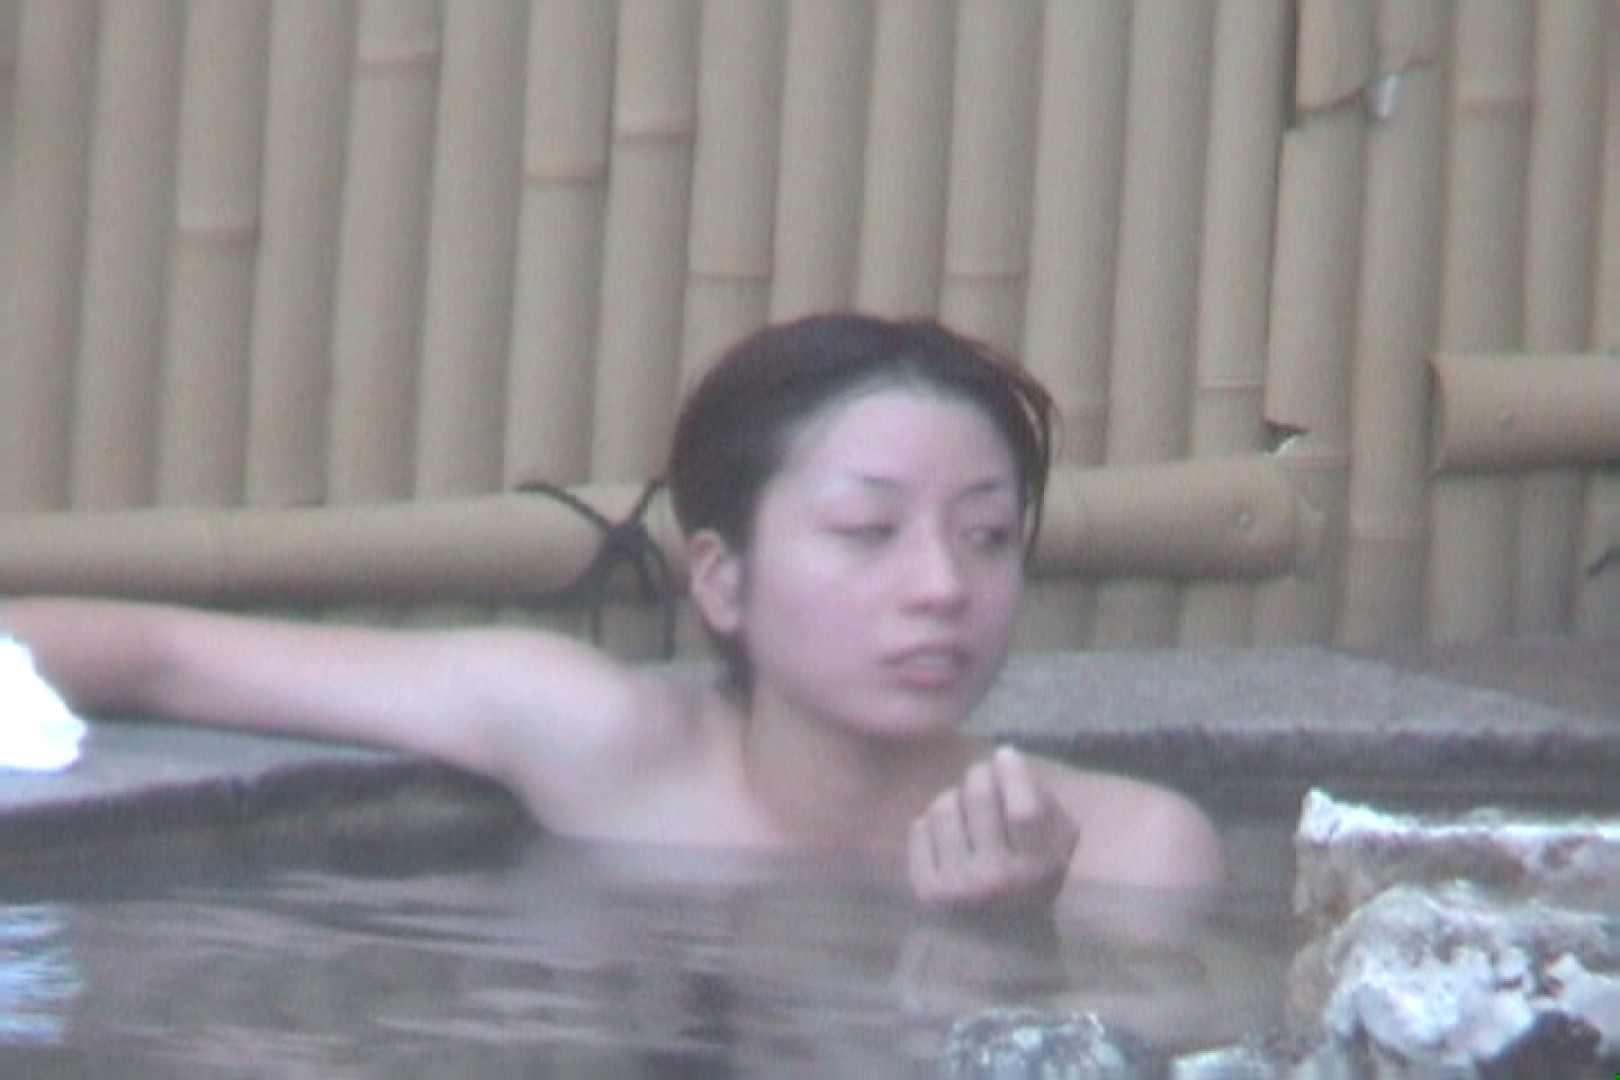 Aquaな露天風呂Vol.608 HなOL | 盗撮  89pic 72